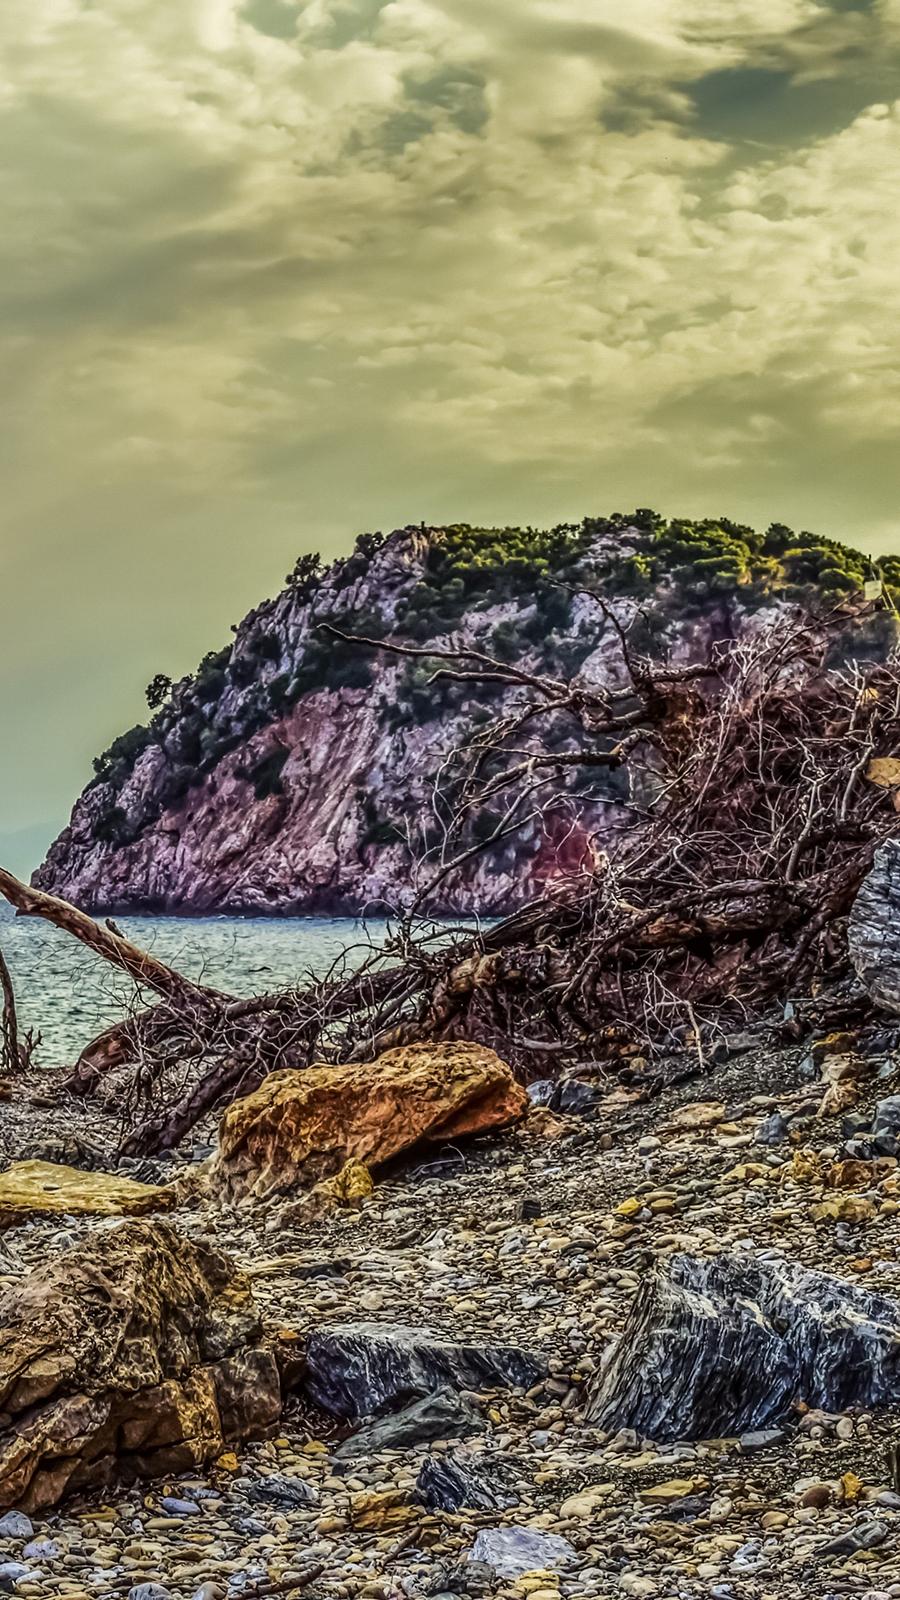 Beach Pebble Rock Hdr Wallpaper